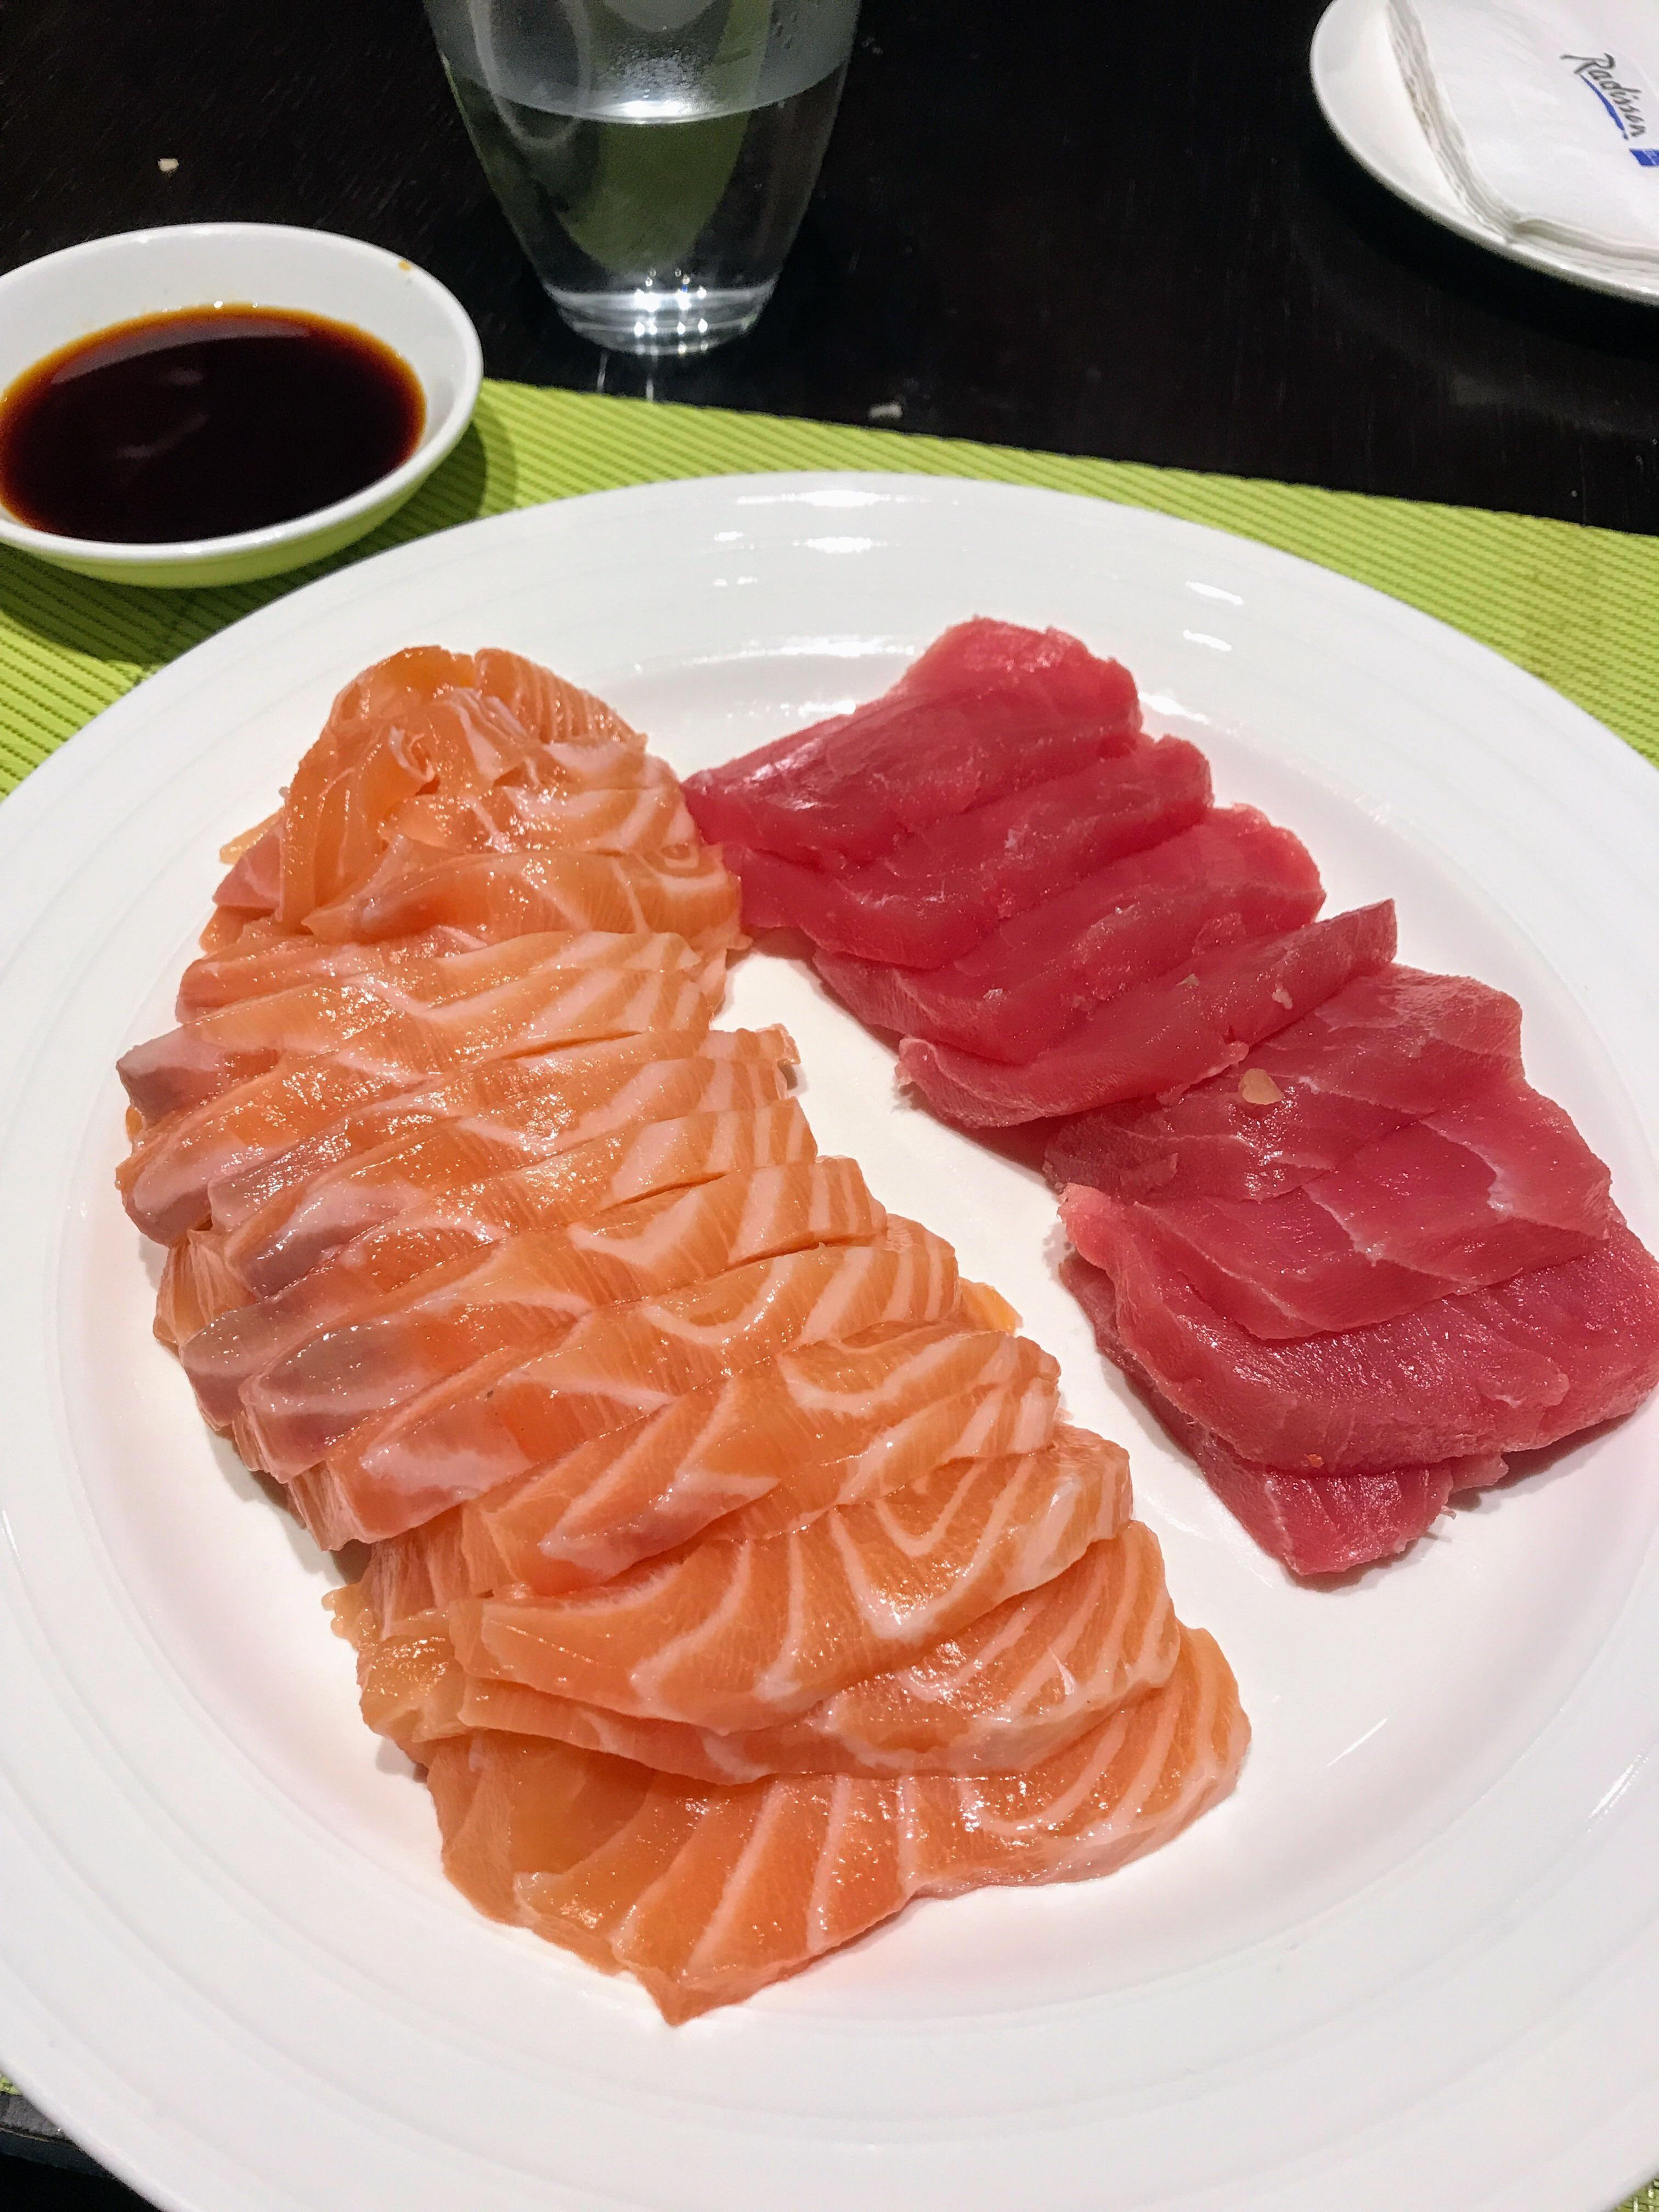 A delicious misinterpretation of quantity for salmon and tuna sashimi in Chongqing China [3024x4032]